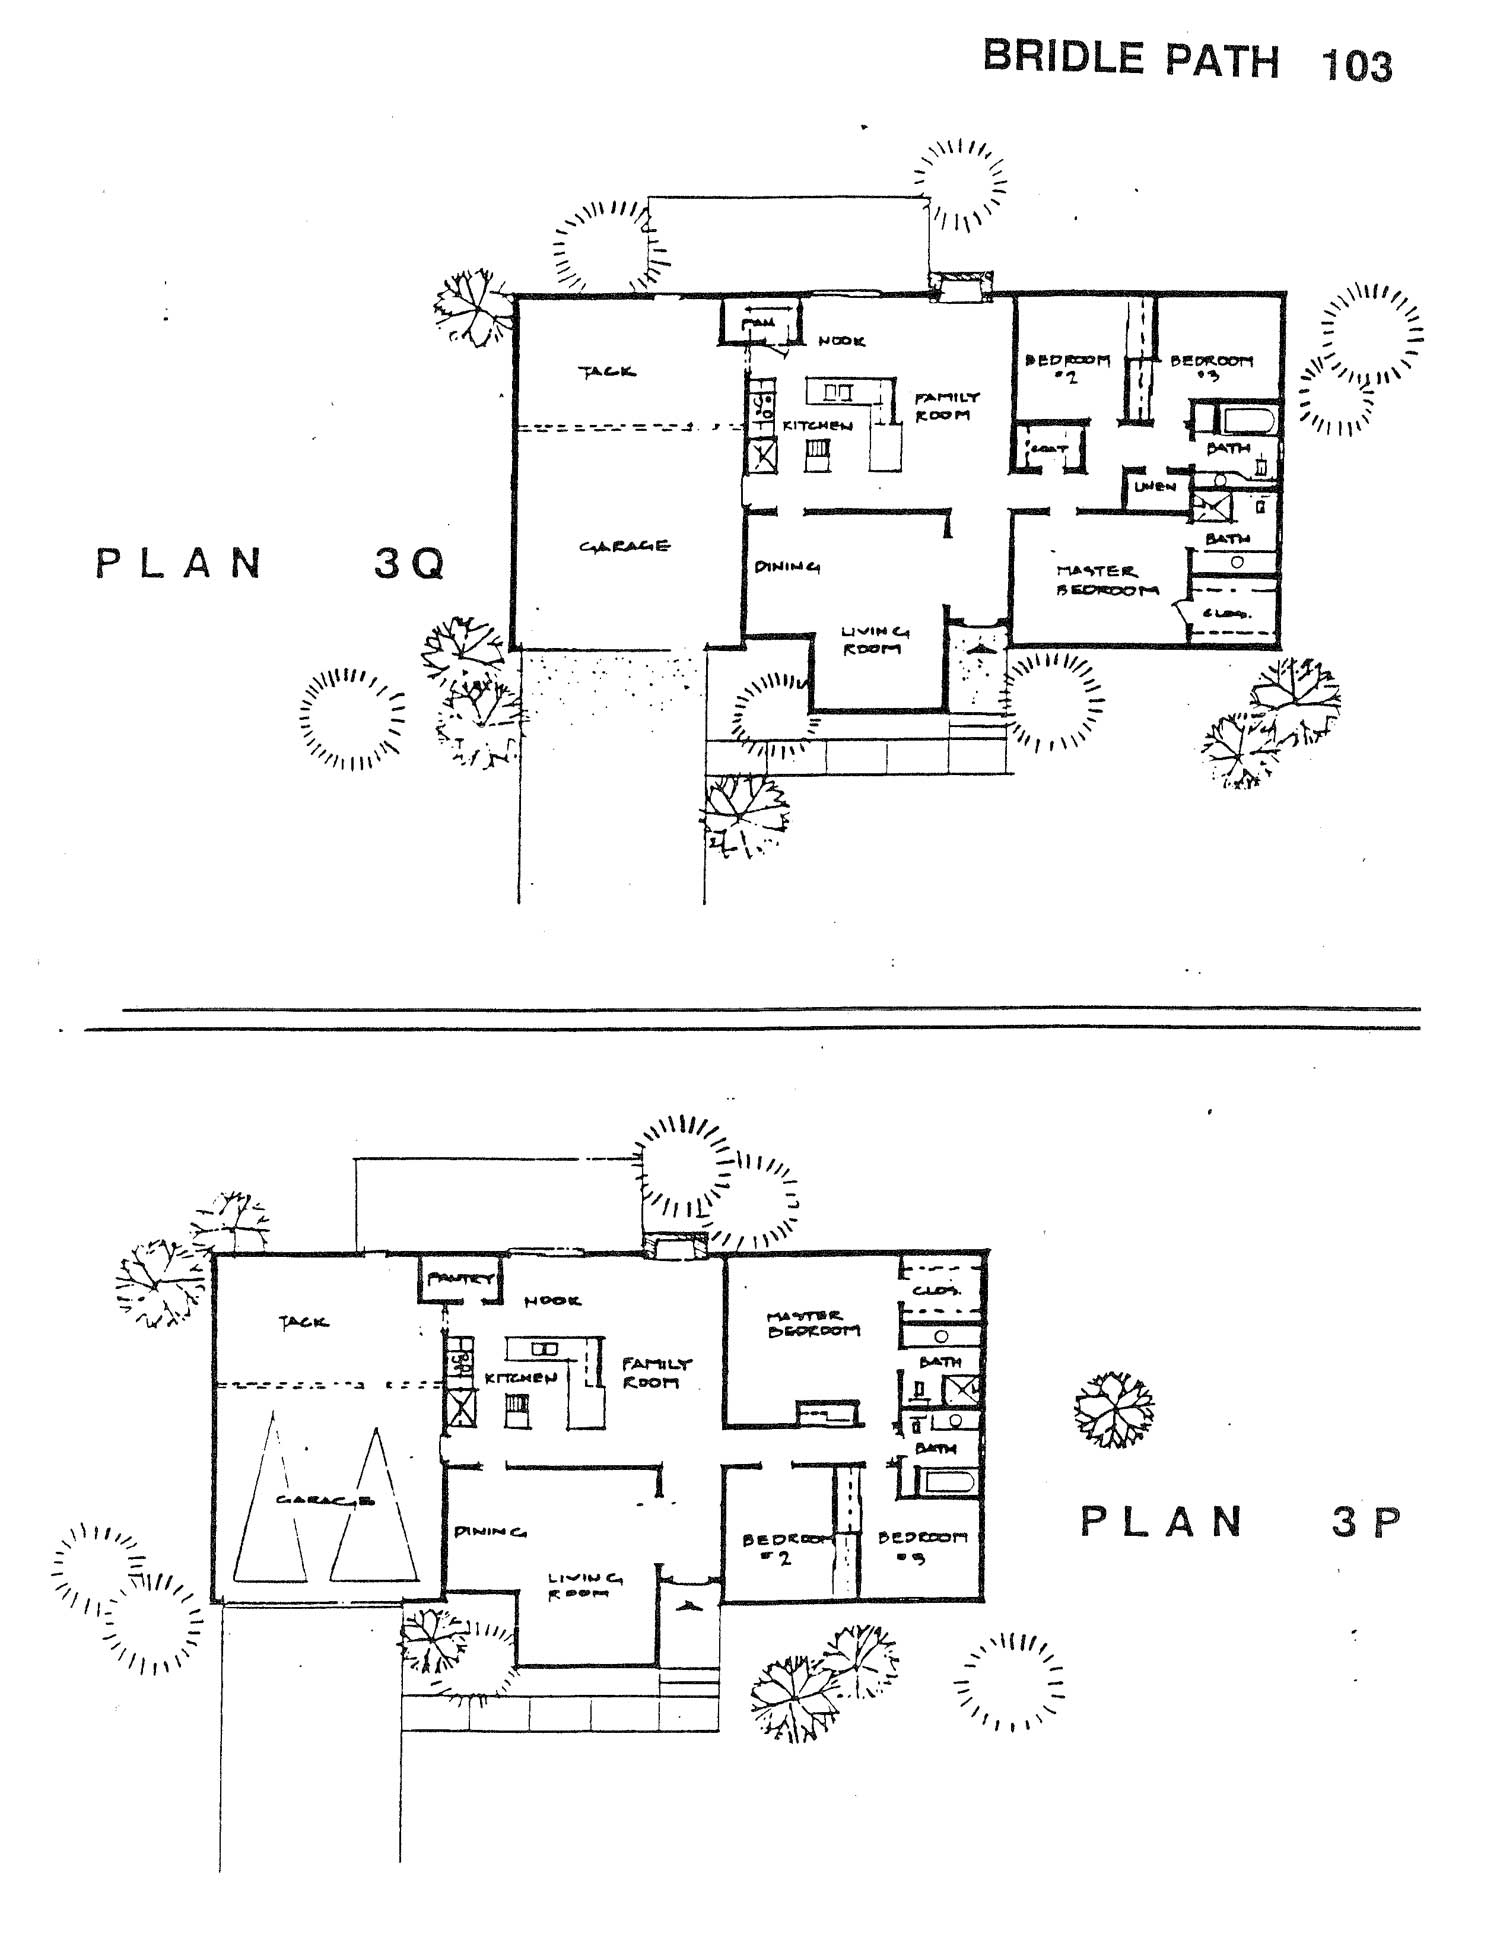 Bridle Path - Plan 3Q & 3P